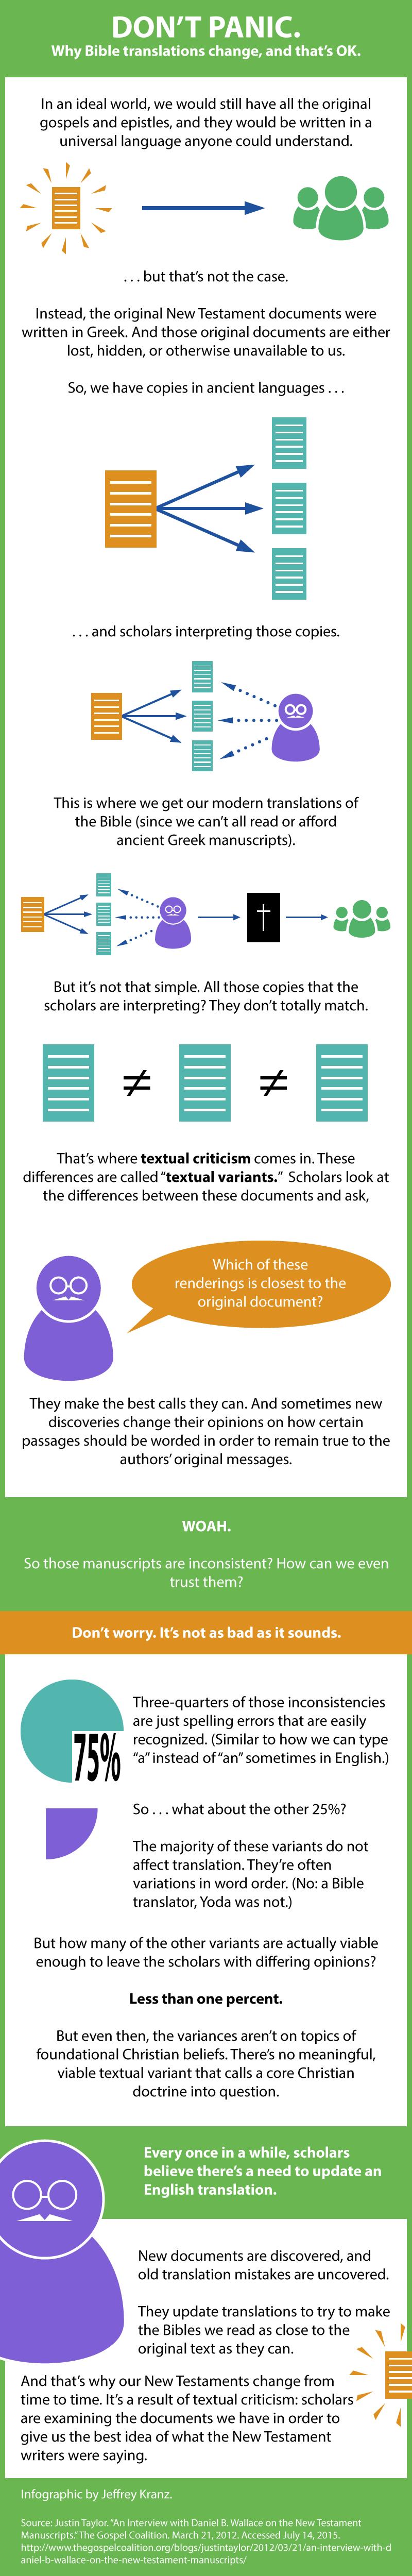 textual-criticism-explanation-illustrated